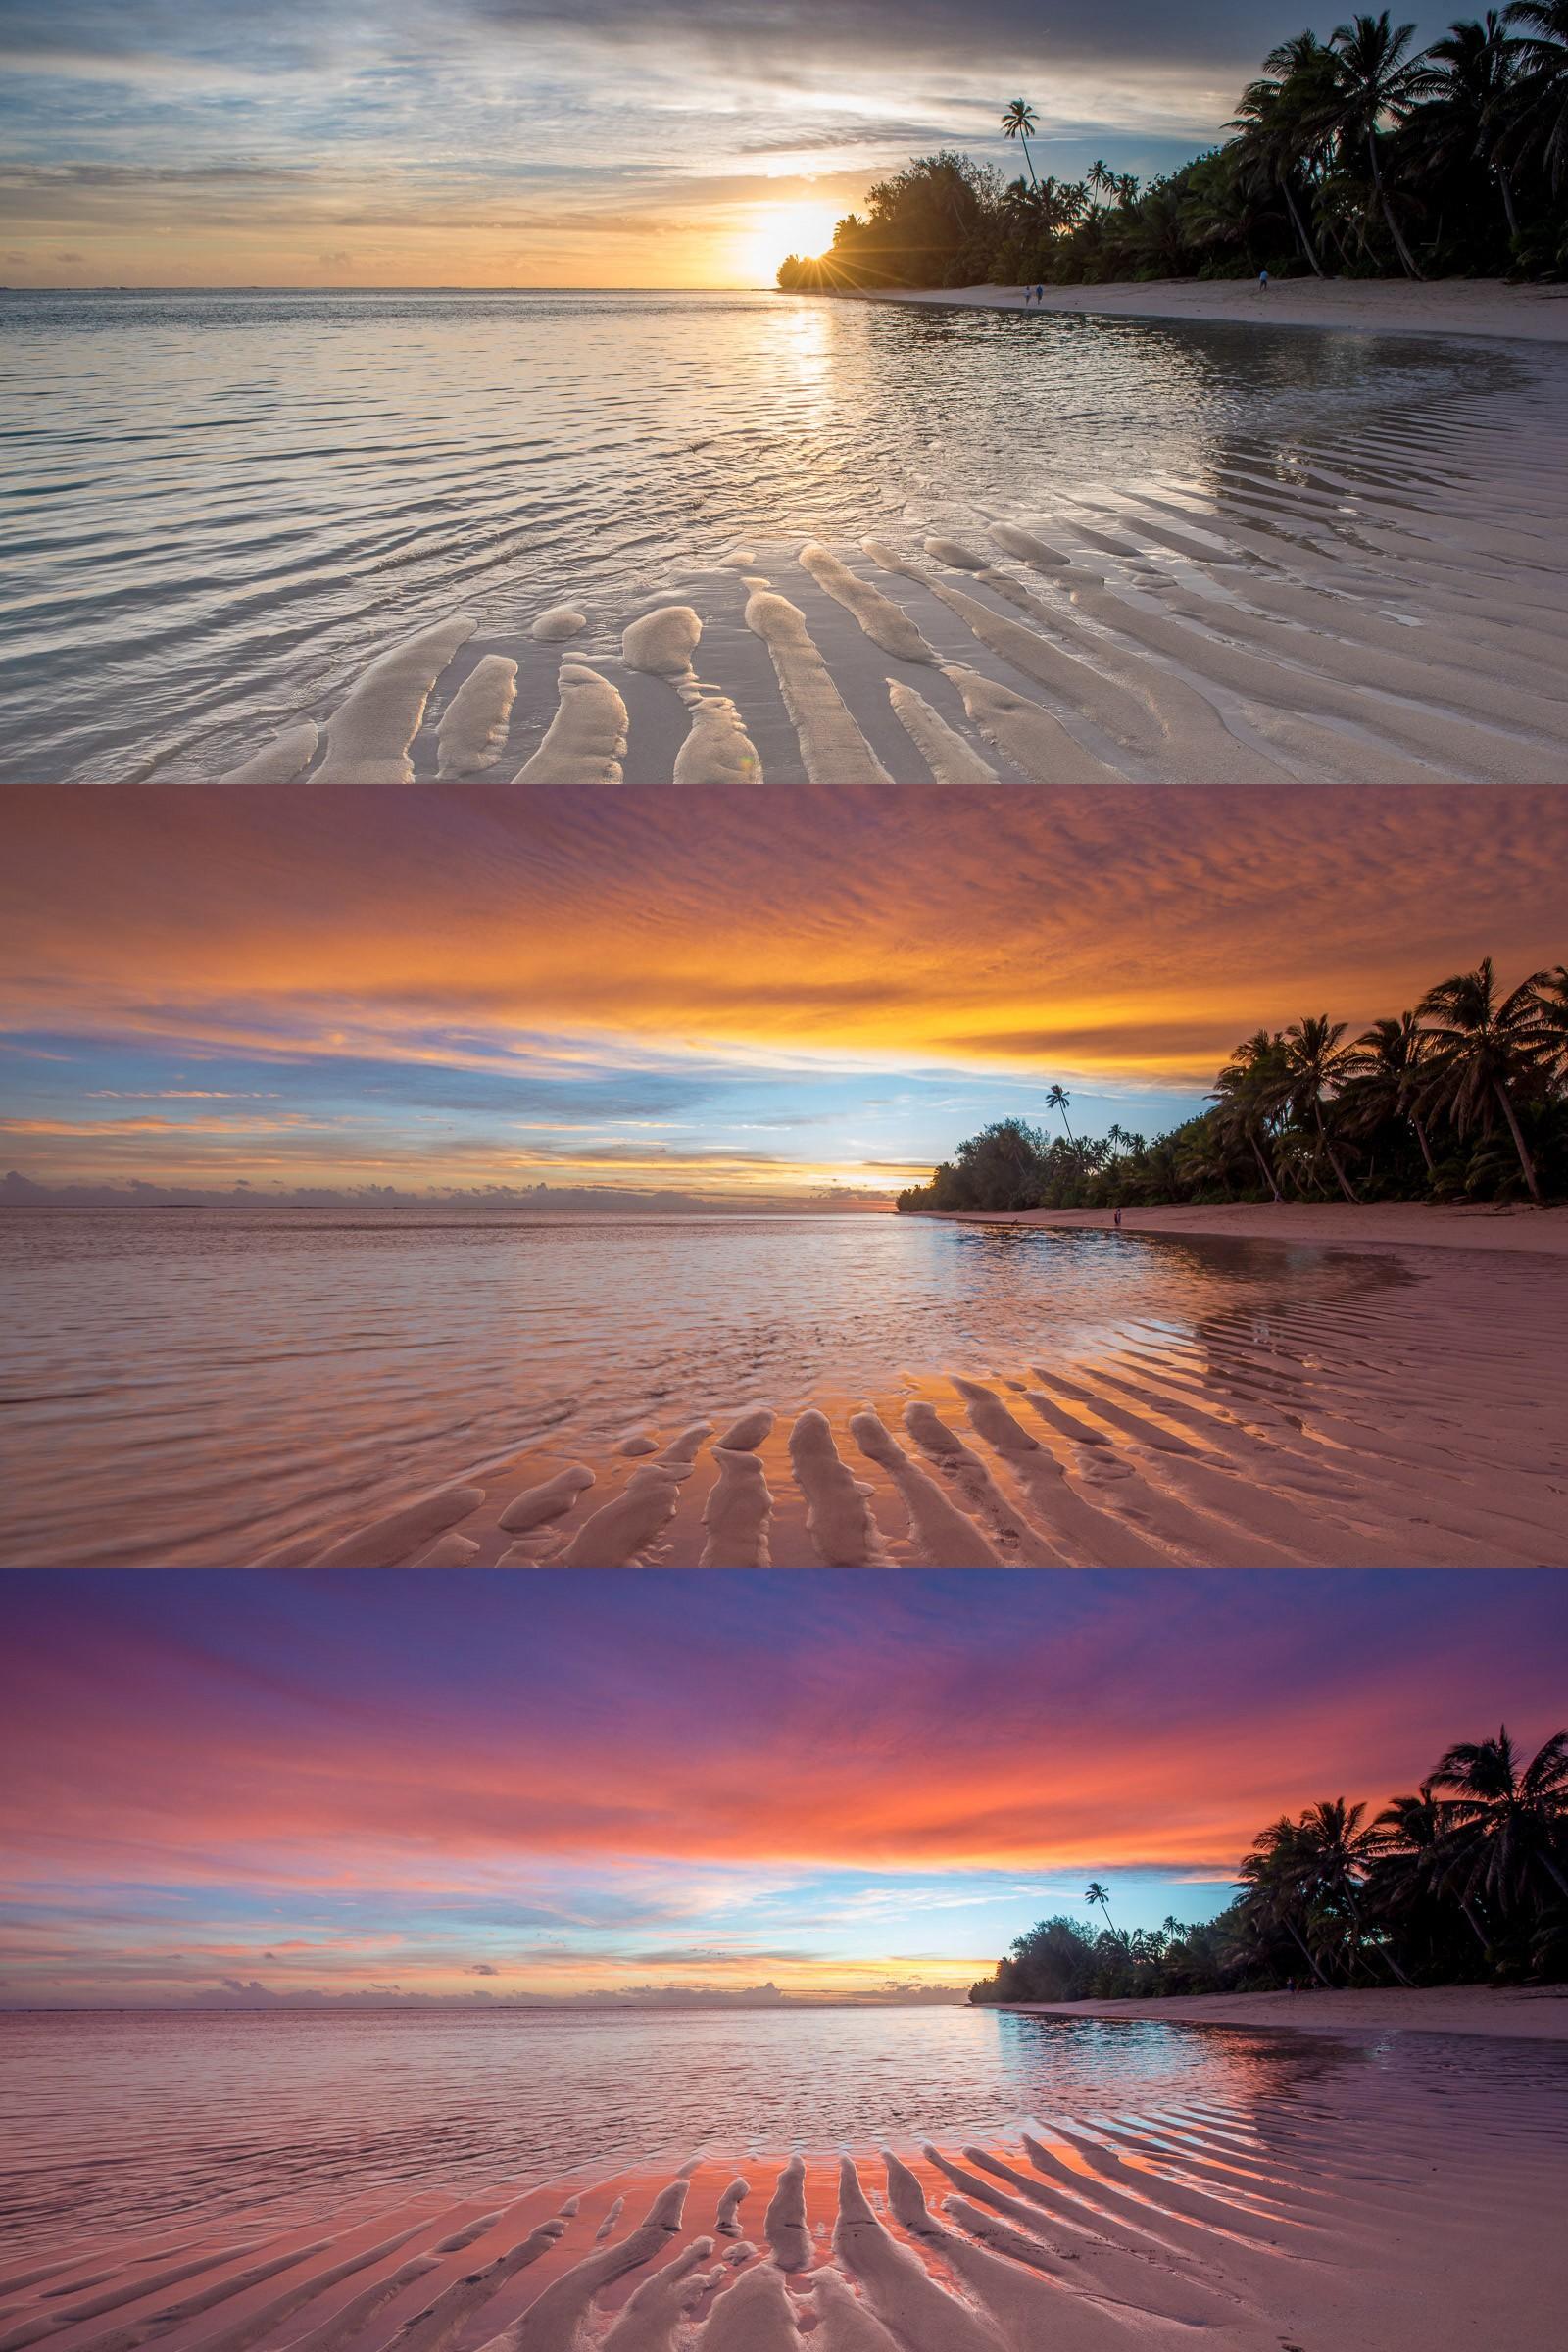 De allermooiste zonsondergang